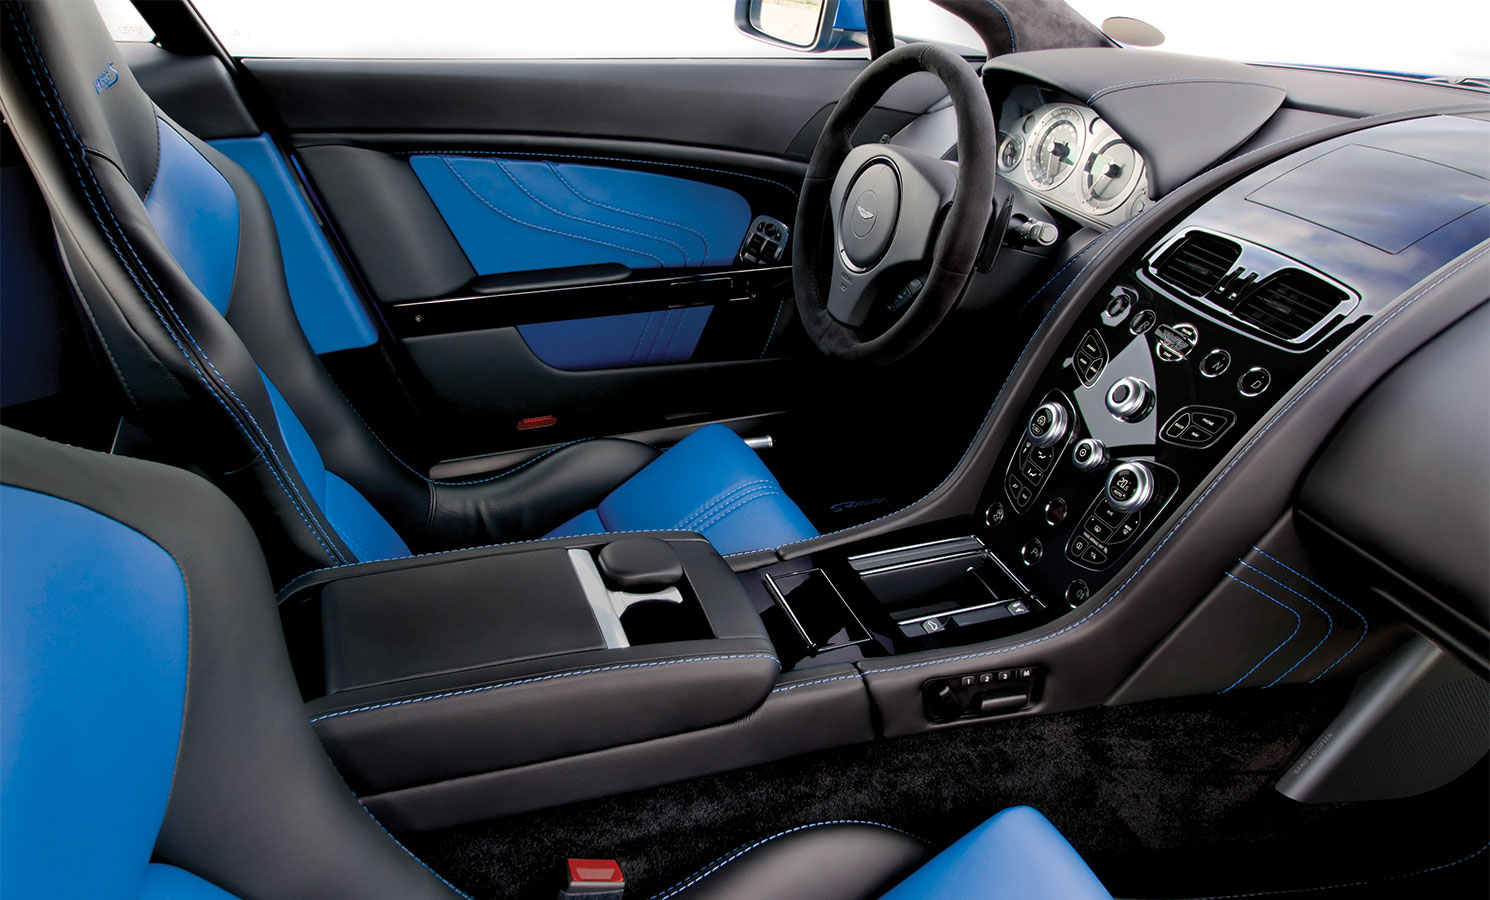 Aston Martin Vantage S High Quality Background on Wallpapers Vista